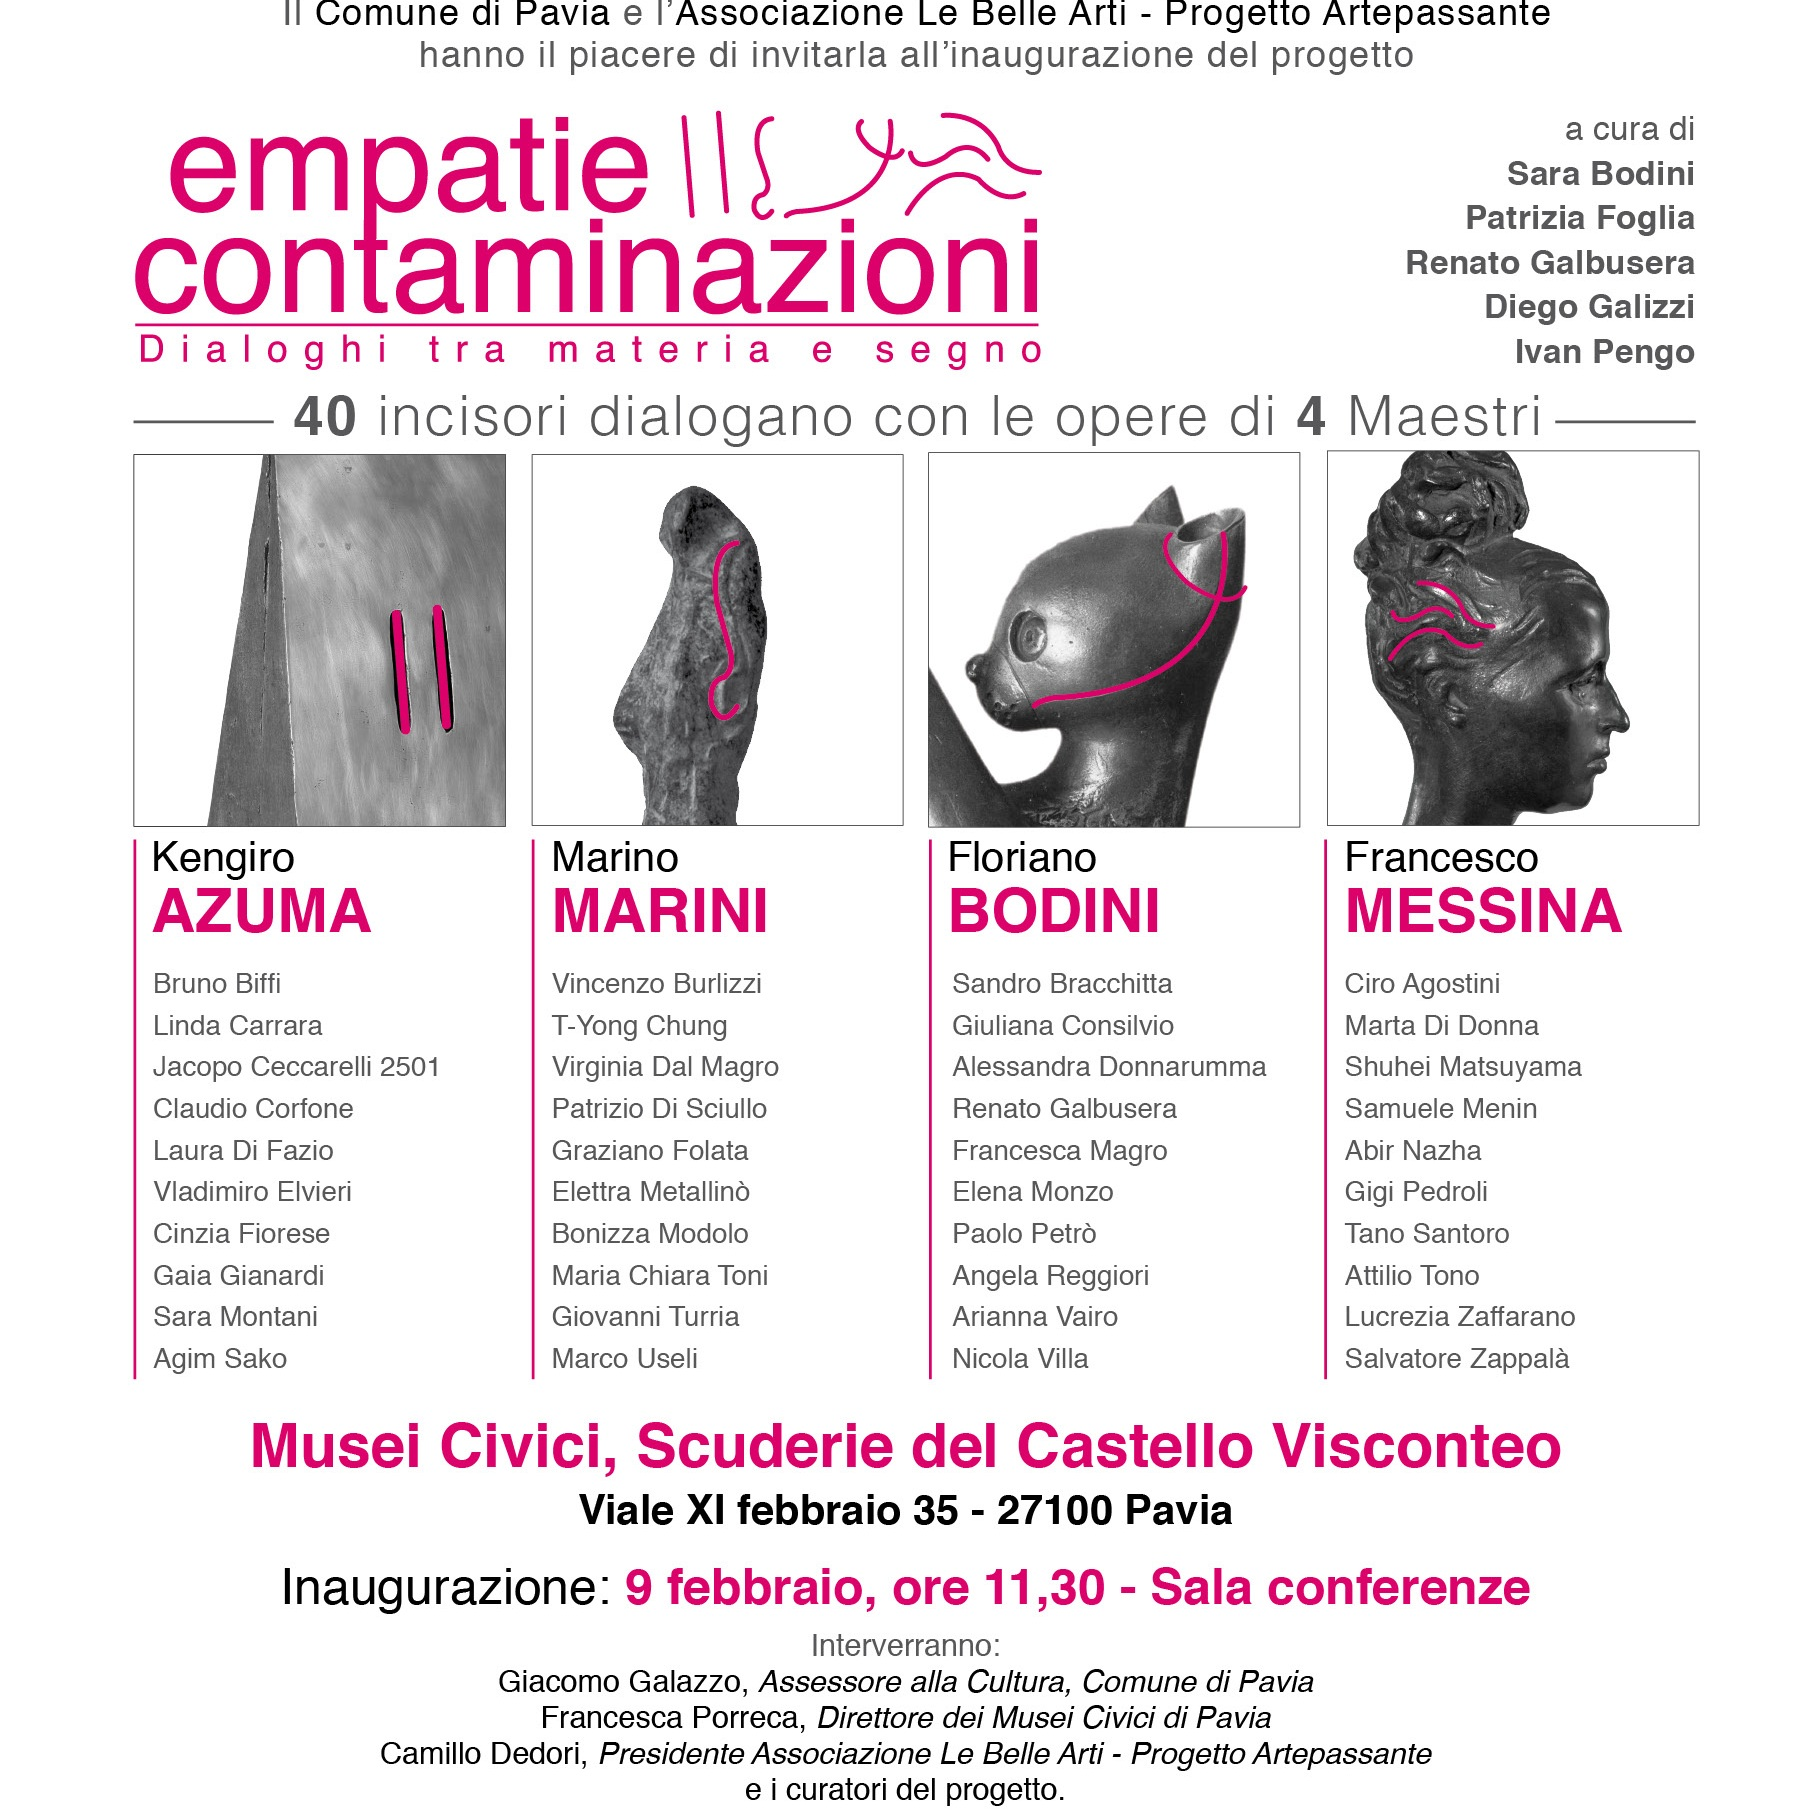 Empatie / Contaminazioni - Pavia